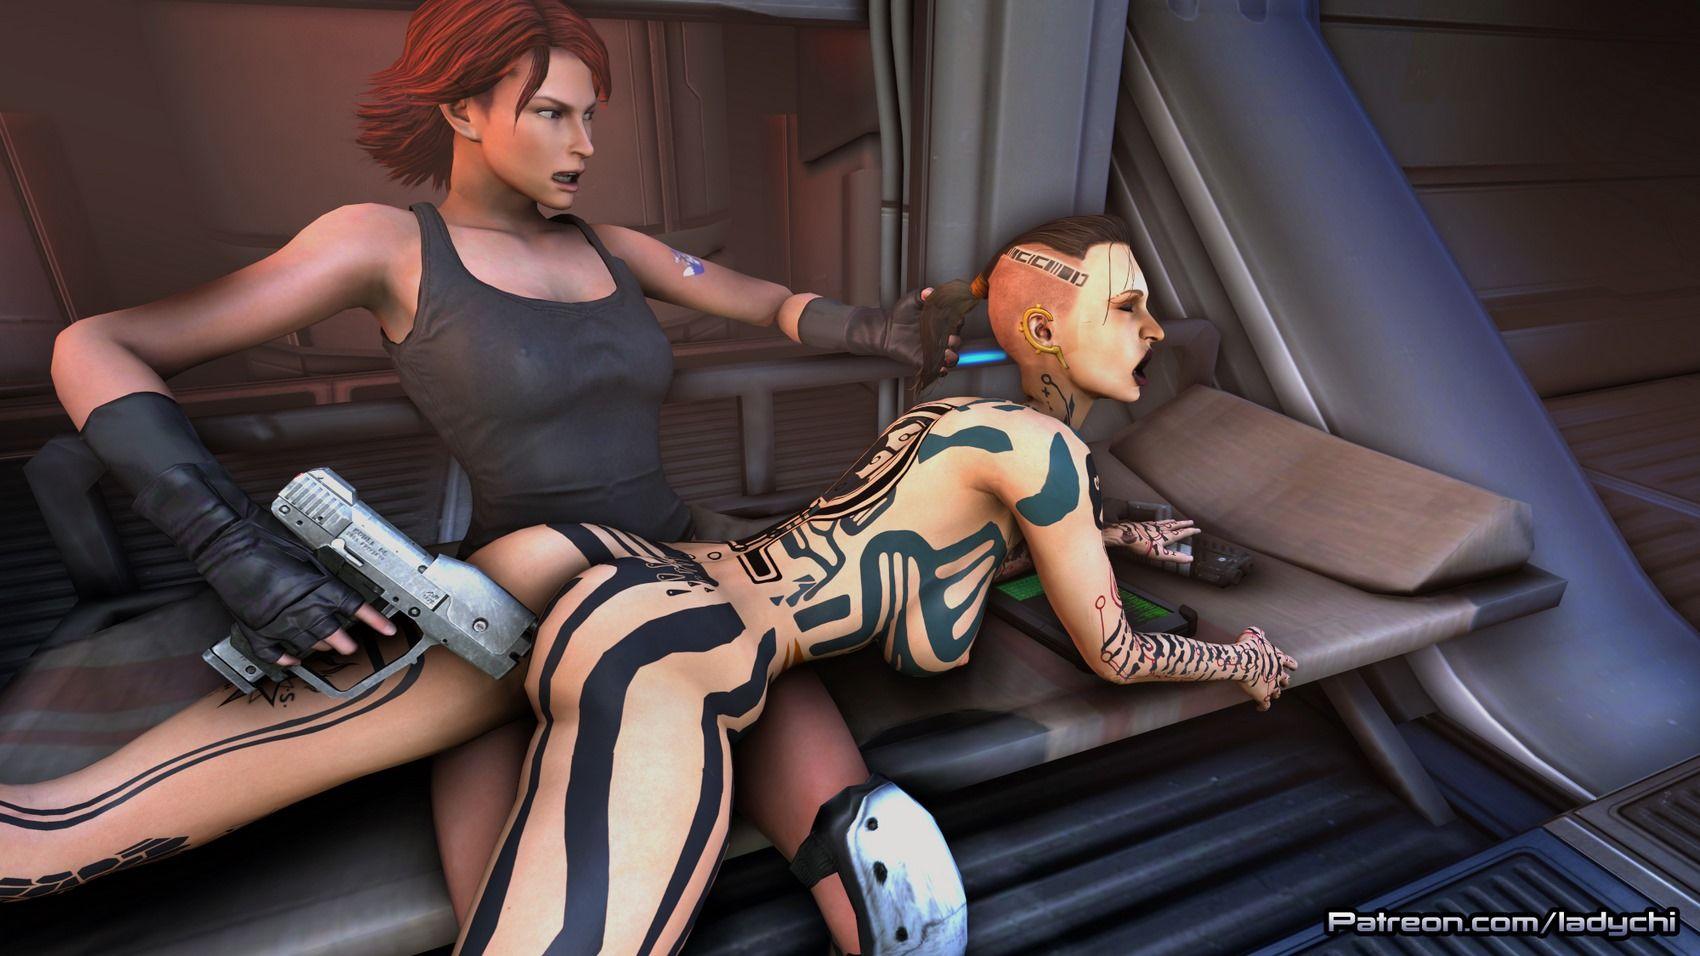 Jacks_Dream_Ladychi_(Mass_Effect) comix_57883.jpg